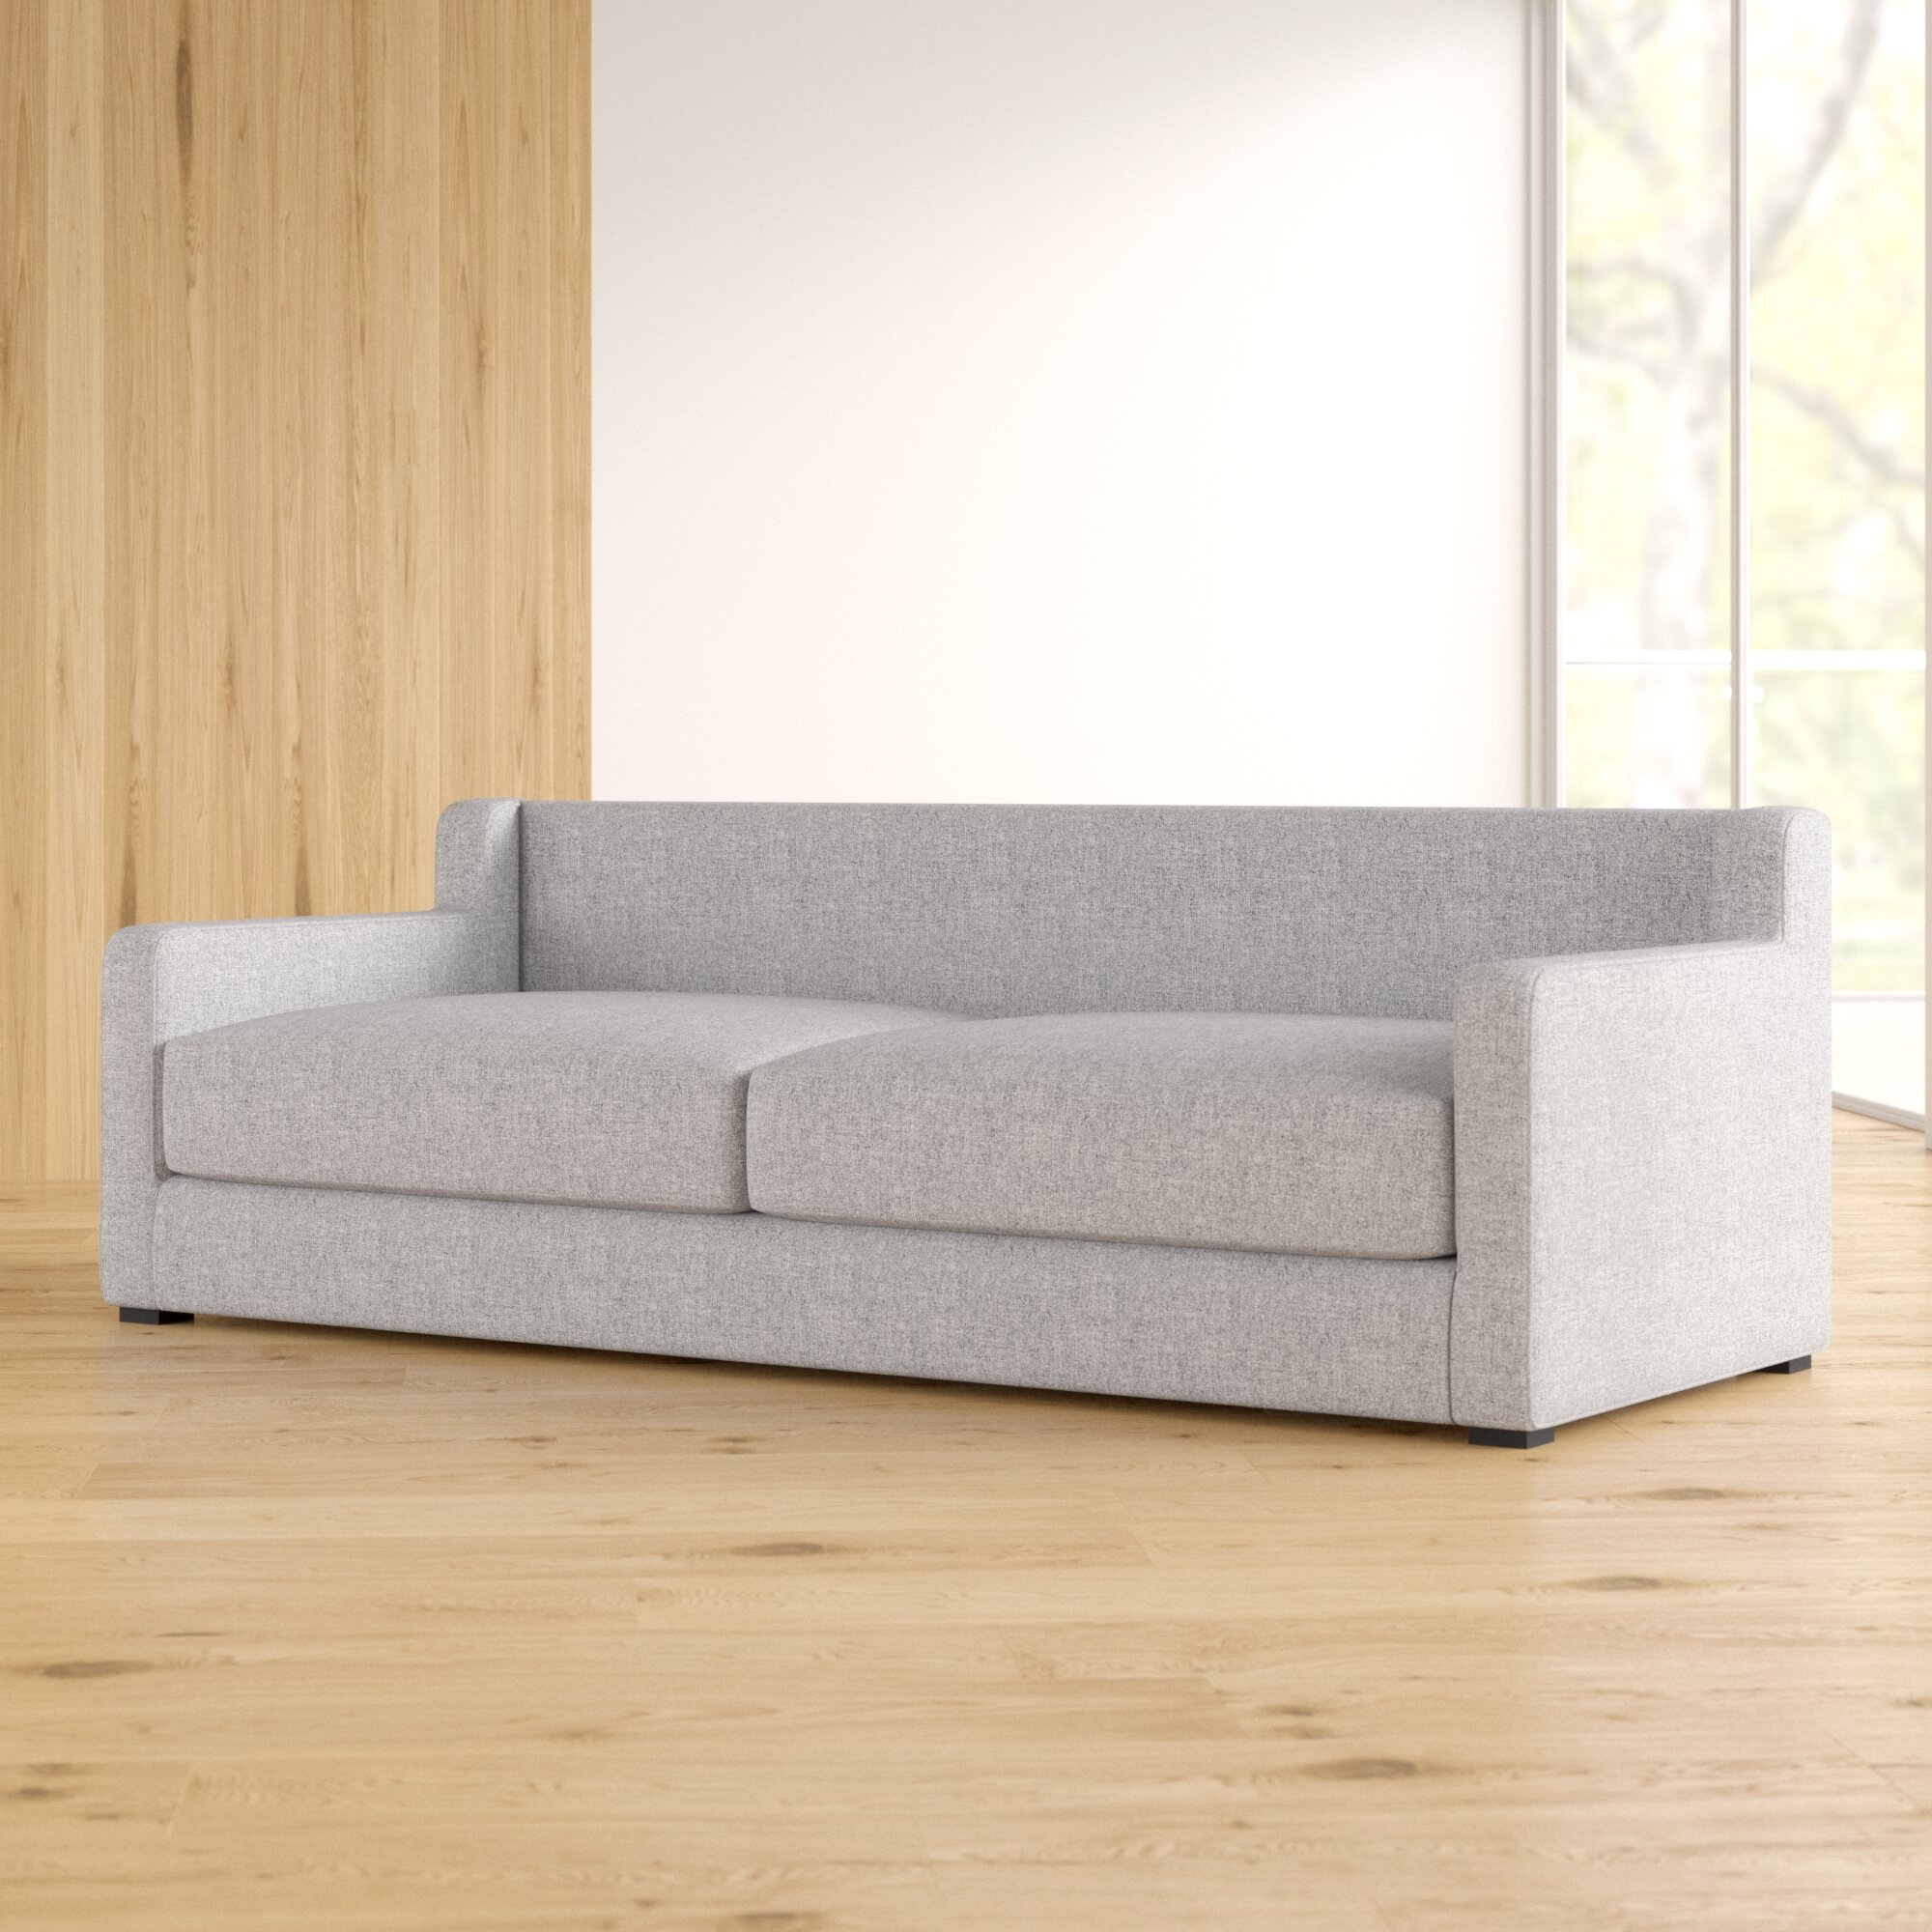 Gus Modern 86 Square Arm Sofa Bed